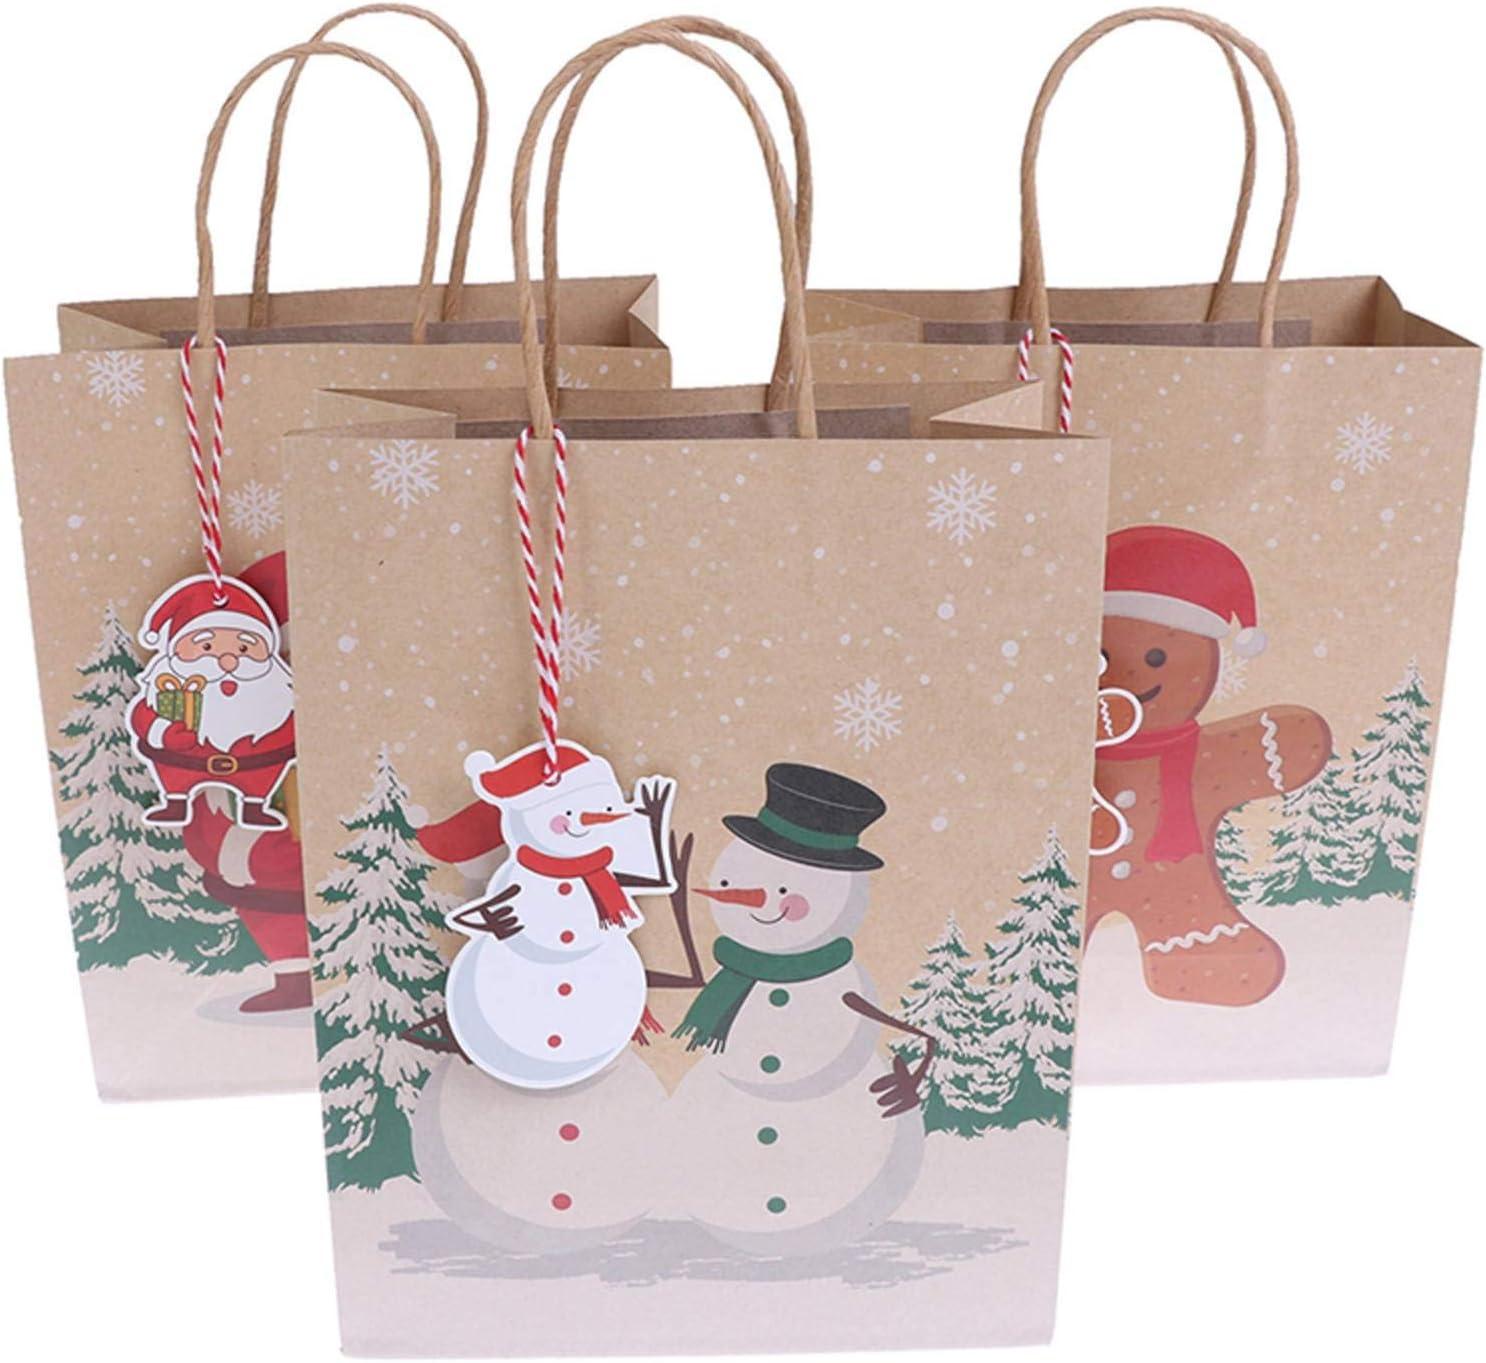 None Brand 6Pcs New Khaki Christmas Recommendation w Bags Santa Bag Large discharge sale Kraft Paper